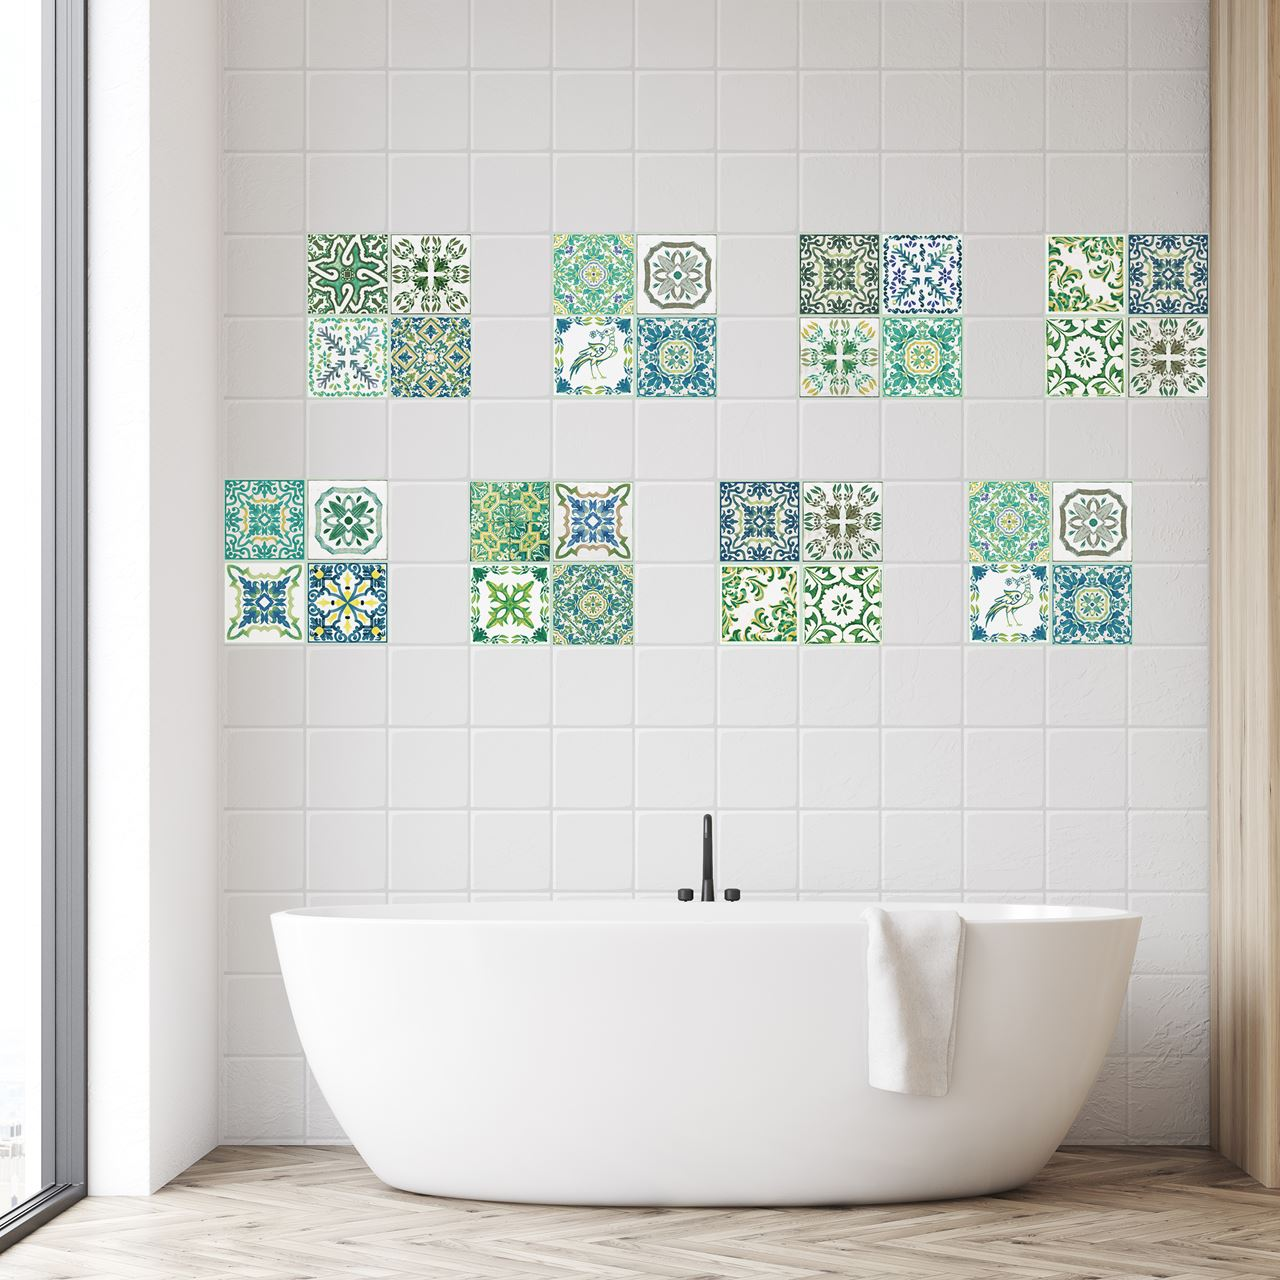 Channel Distribution Gifts En Gadgets Walplus Turkisch Mosaik Wandaufkleber Fliesenaufkleber Grun 20x20 Cm 12 Stucke